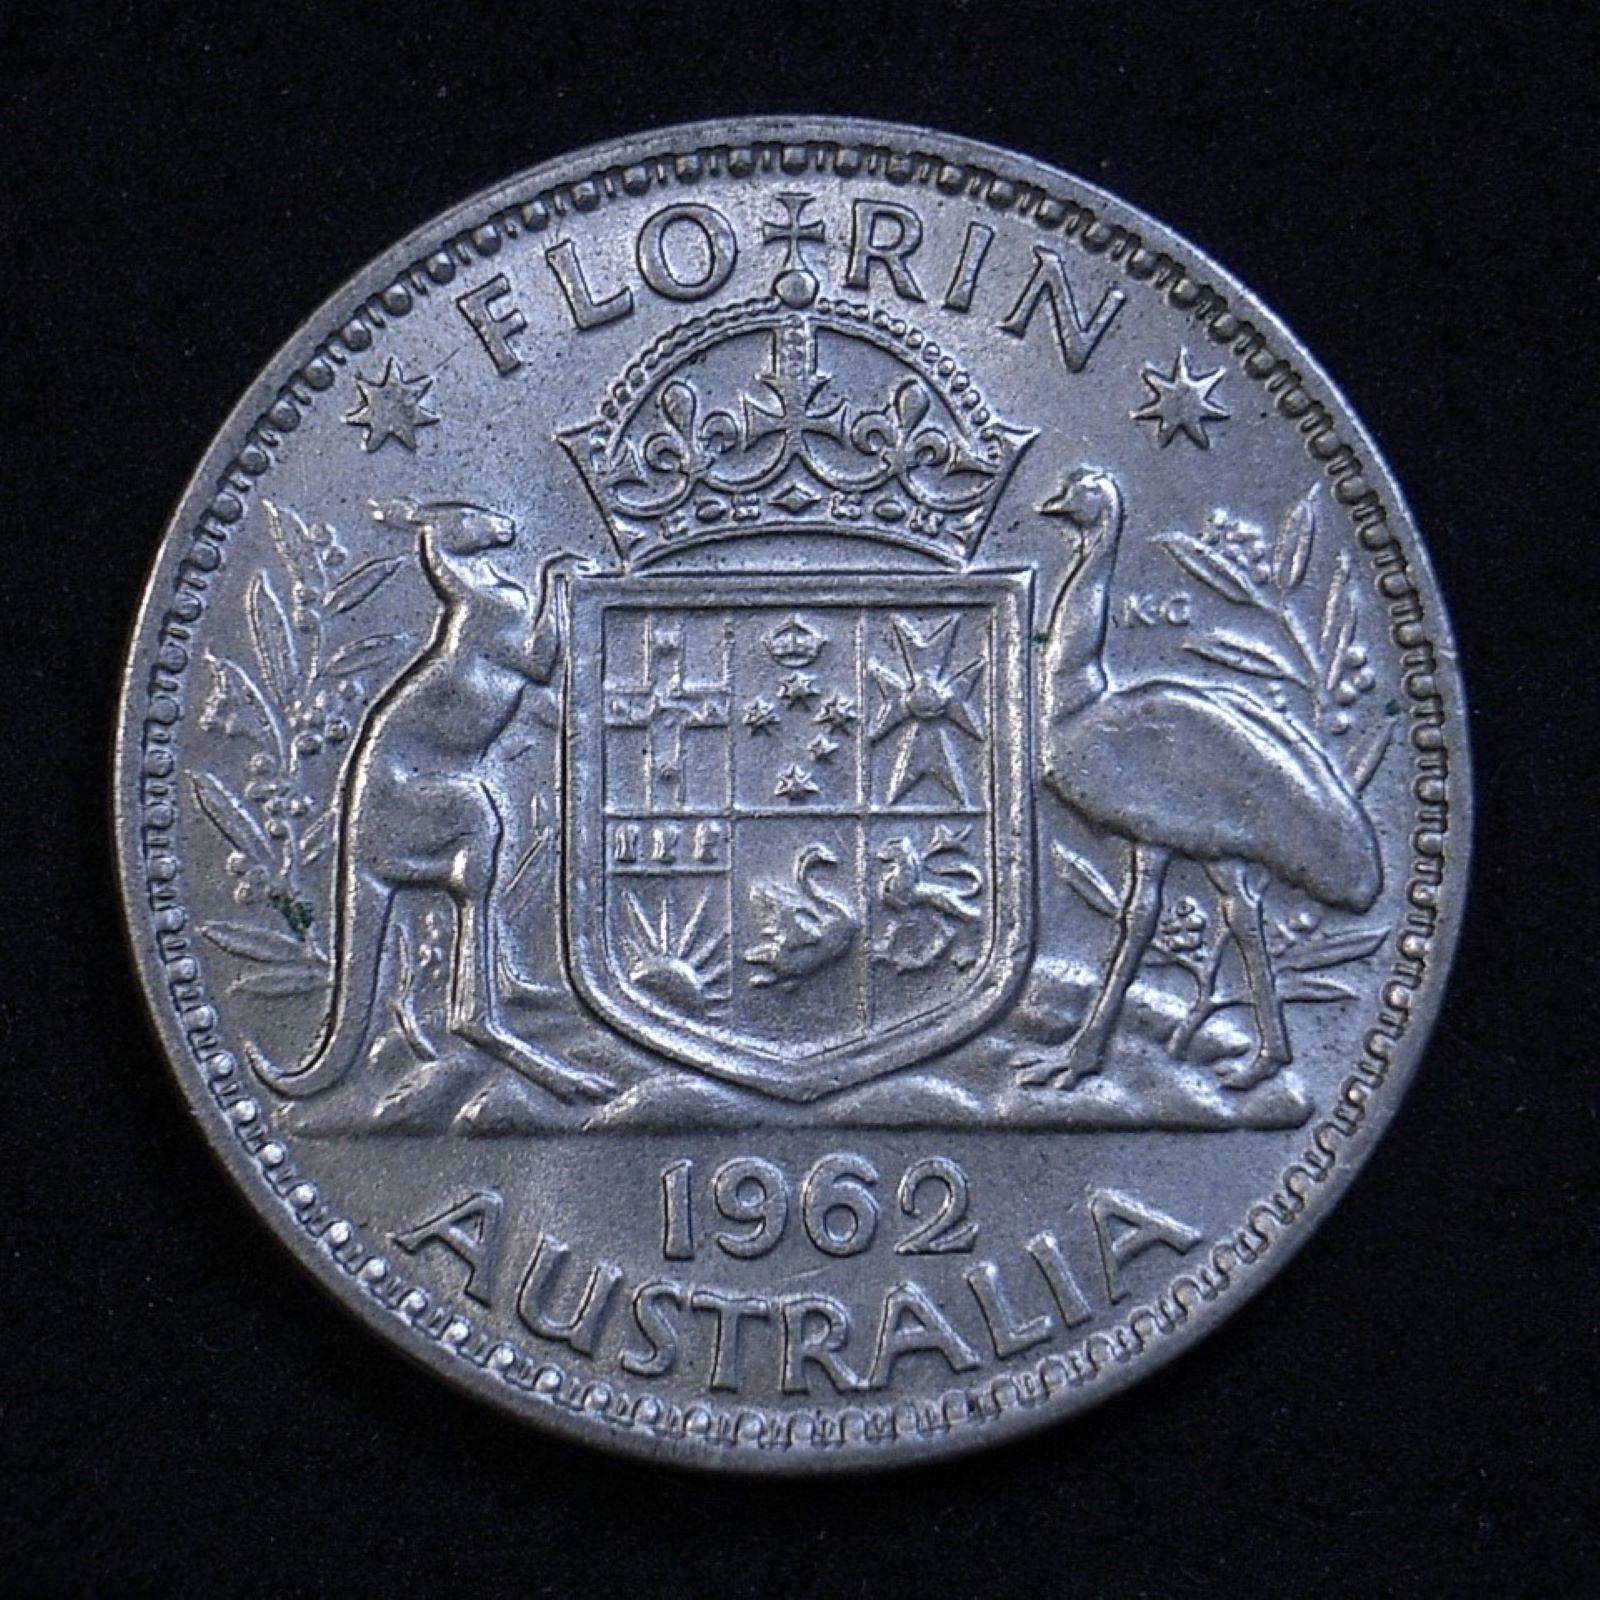 Aus Florin 1962 rev 1